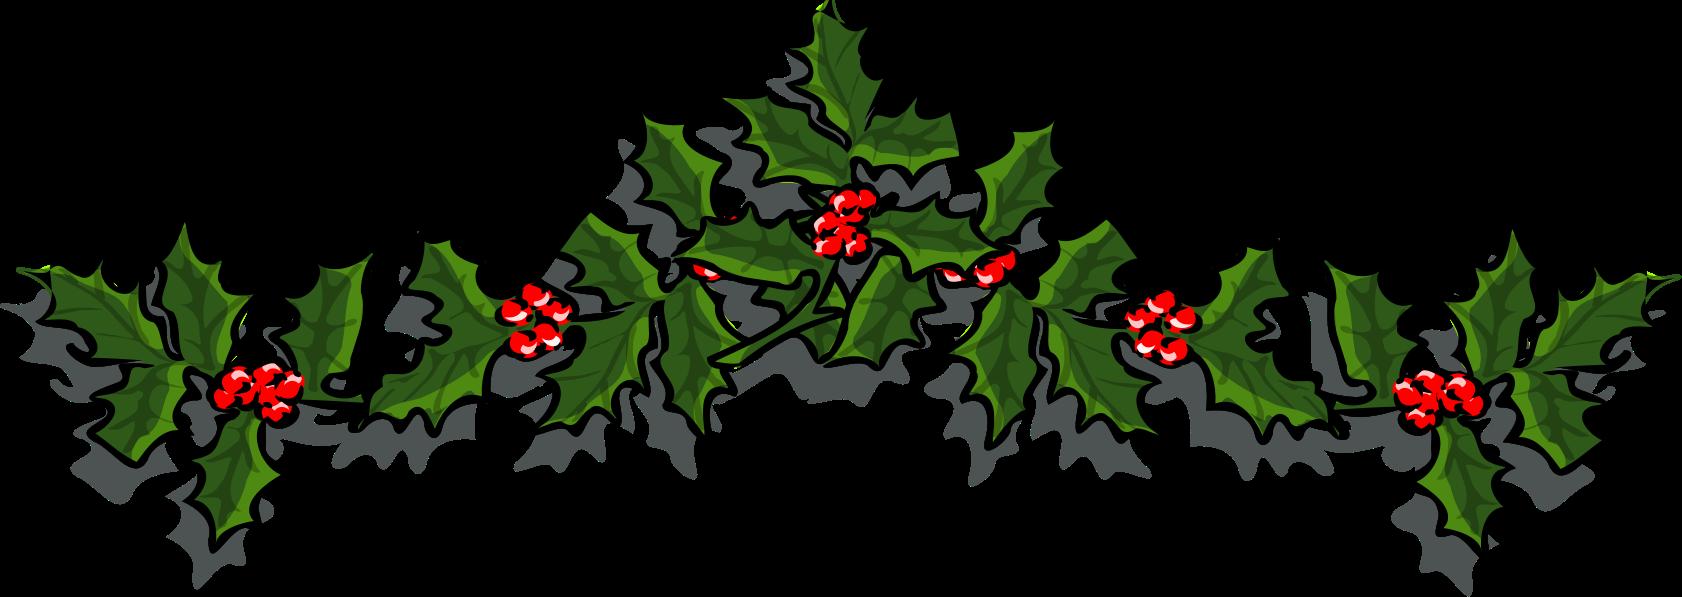 Holiday holly big image. Holidays clipart branch